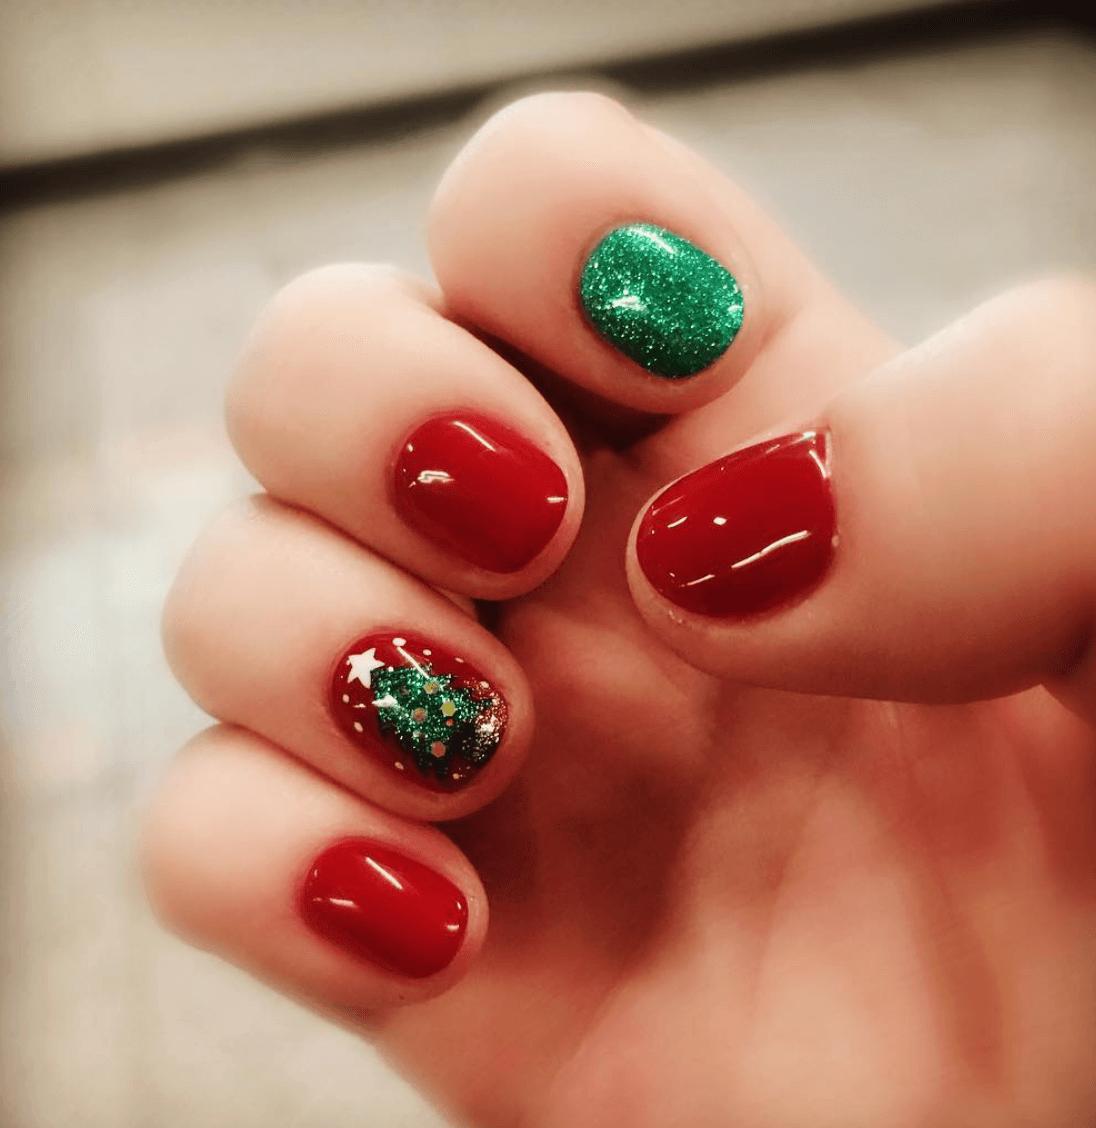 15 Seriously Creative Christmas Nail Art Ideas You Can Do ...